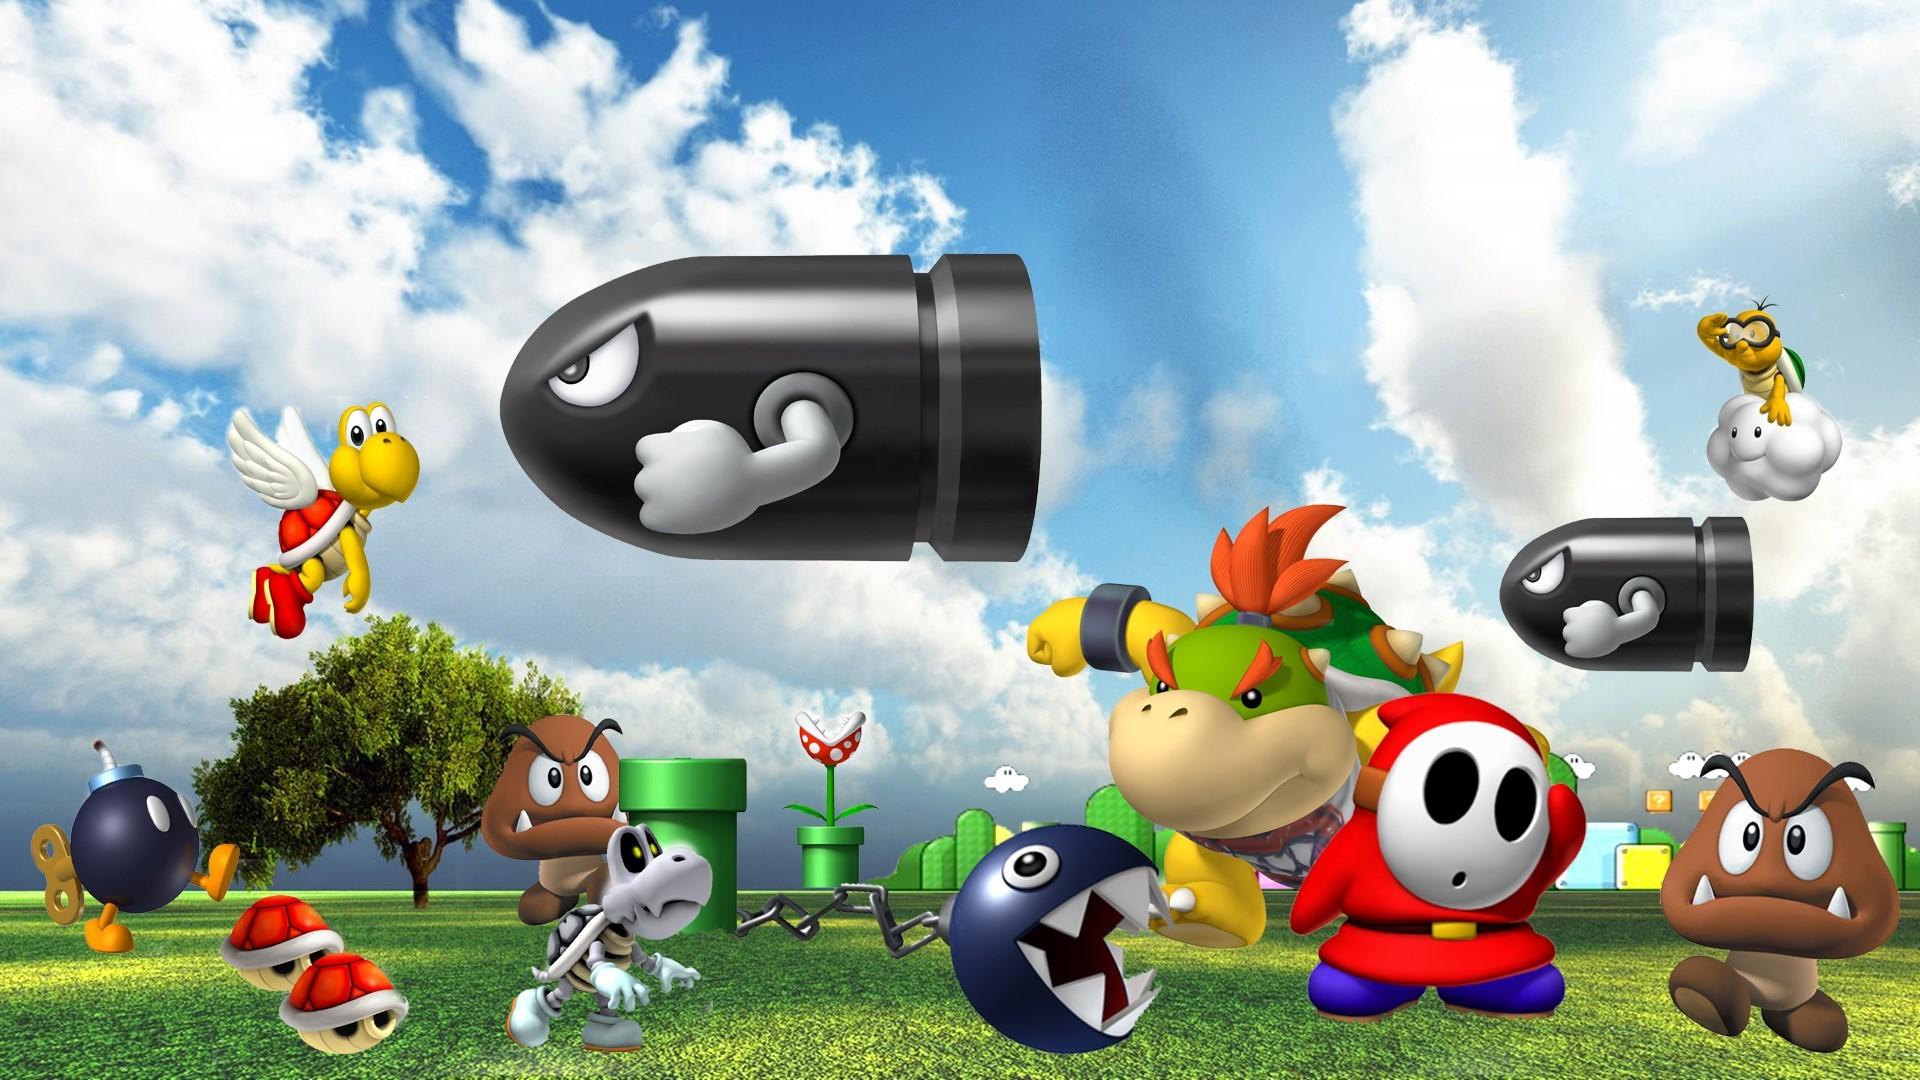 6 Super Mario 64 HD Wallpapers